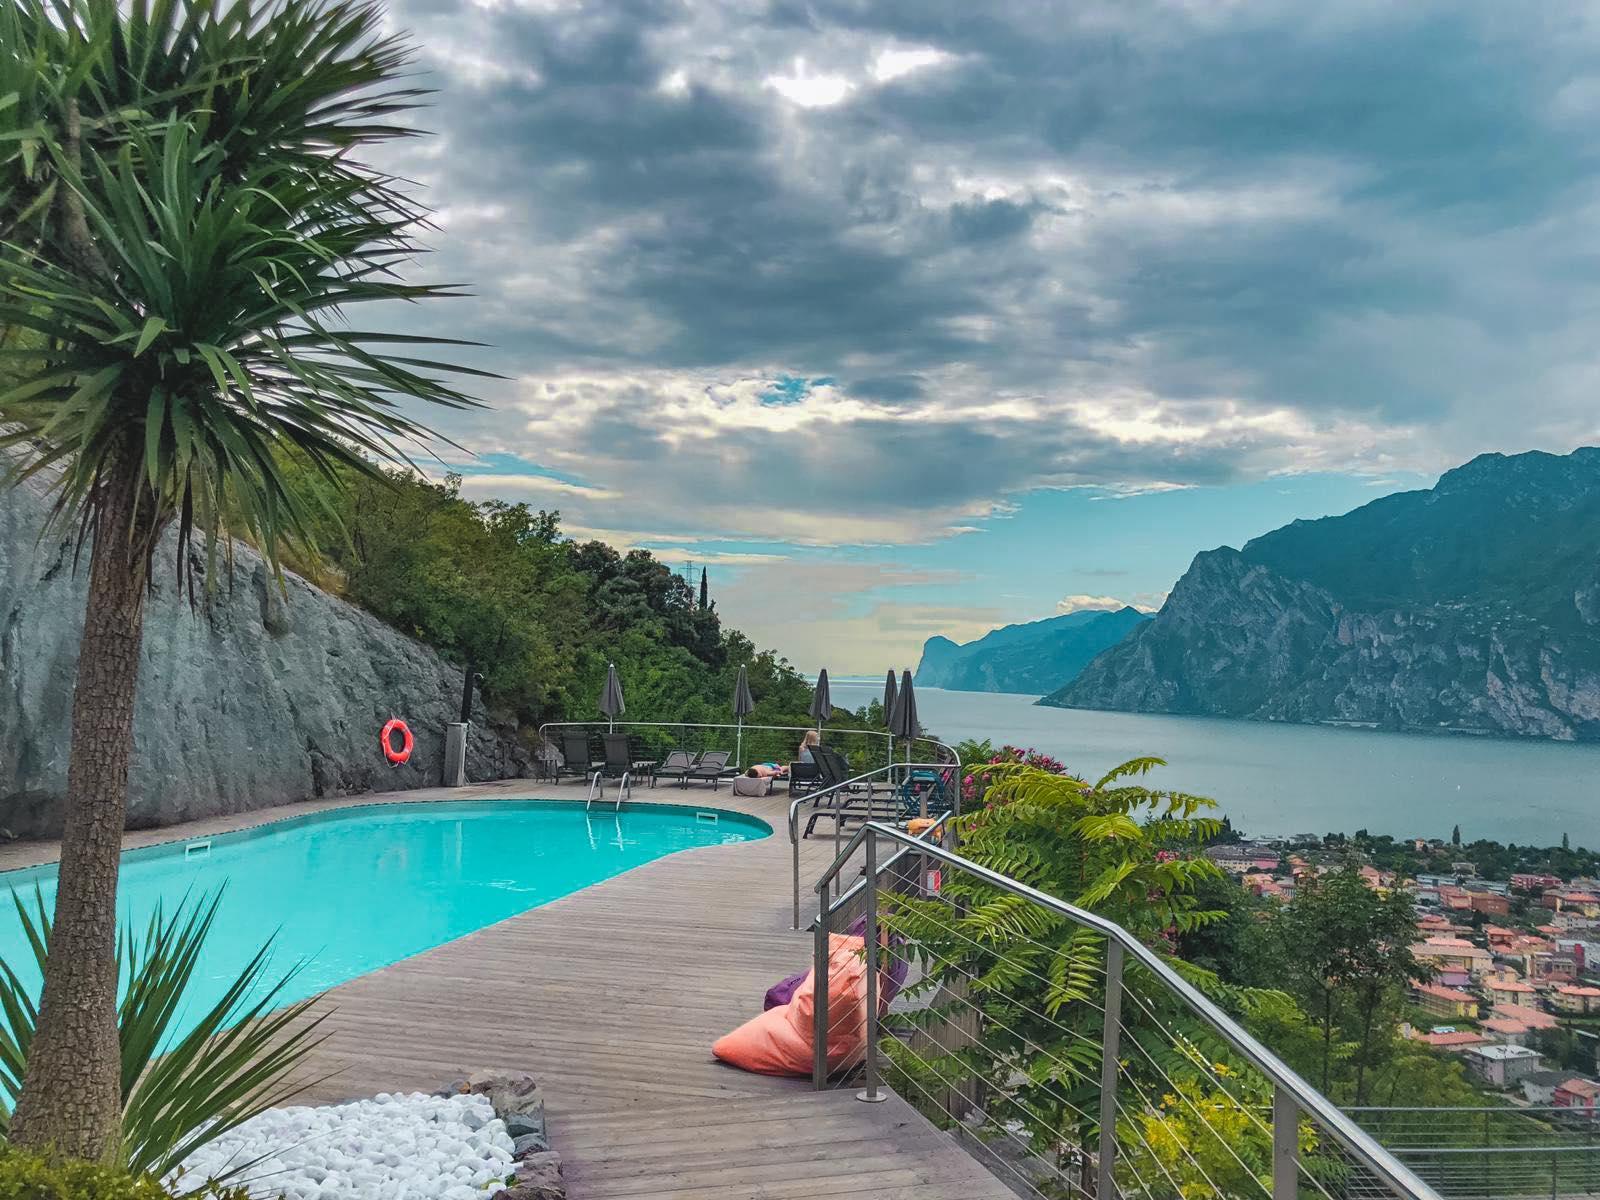 Life On The Road Day 131 Hello from Lago di Garda, ITALY8.jpg